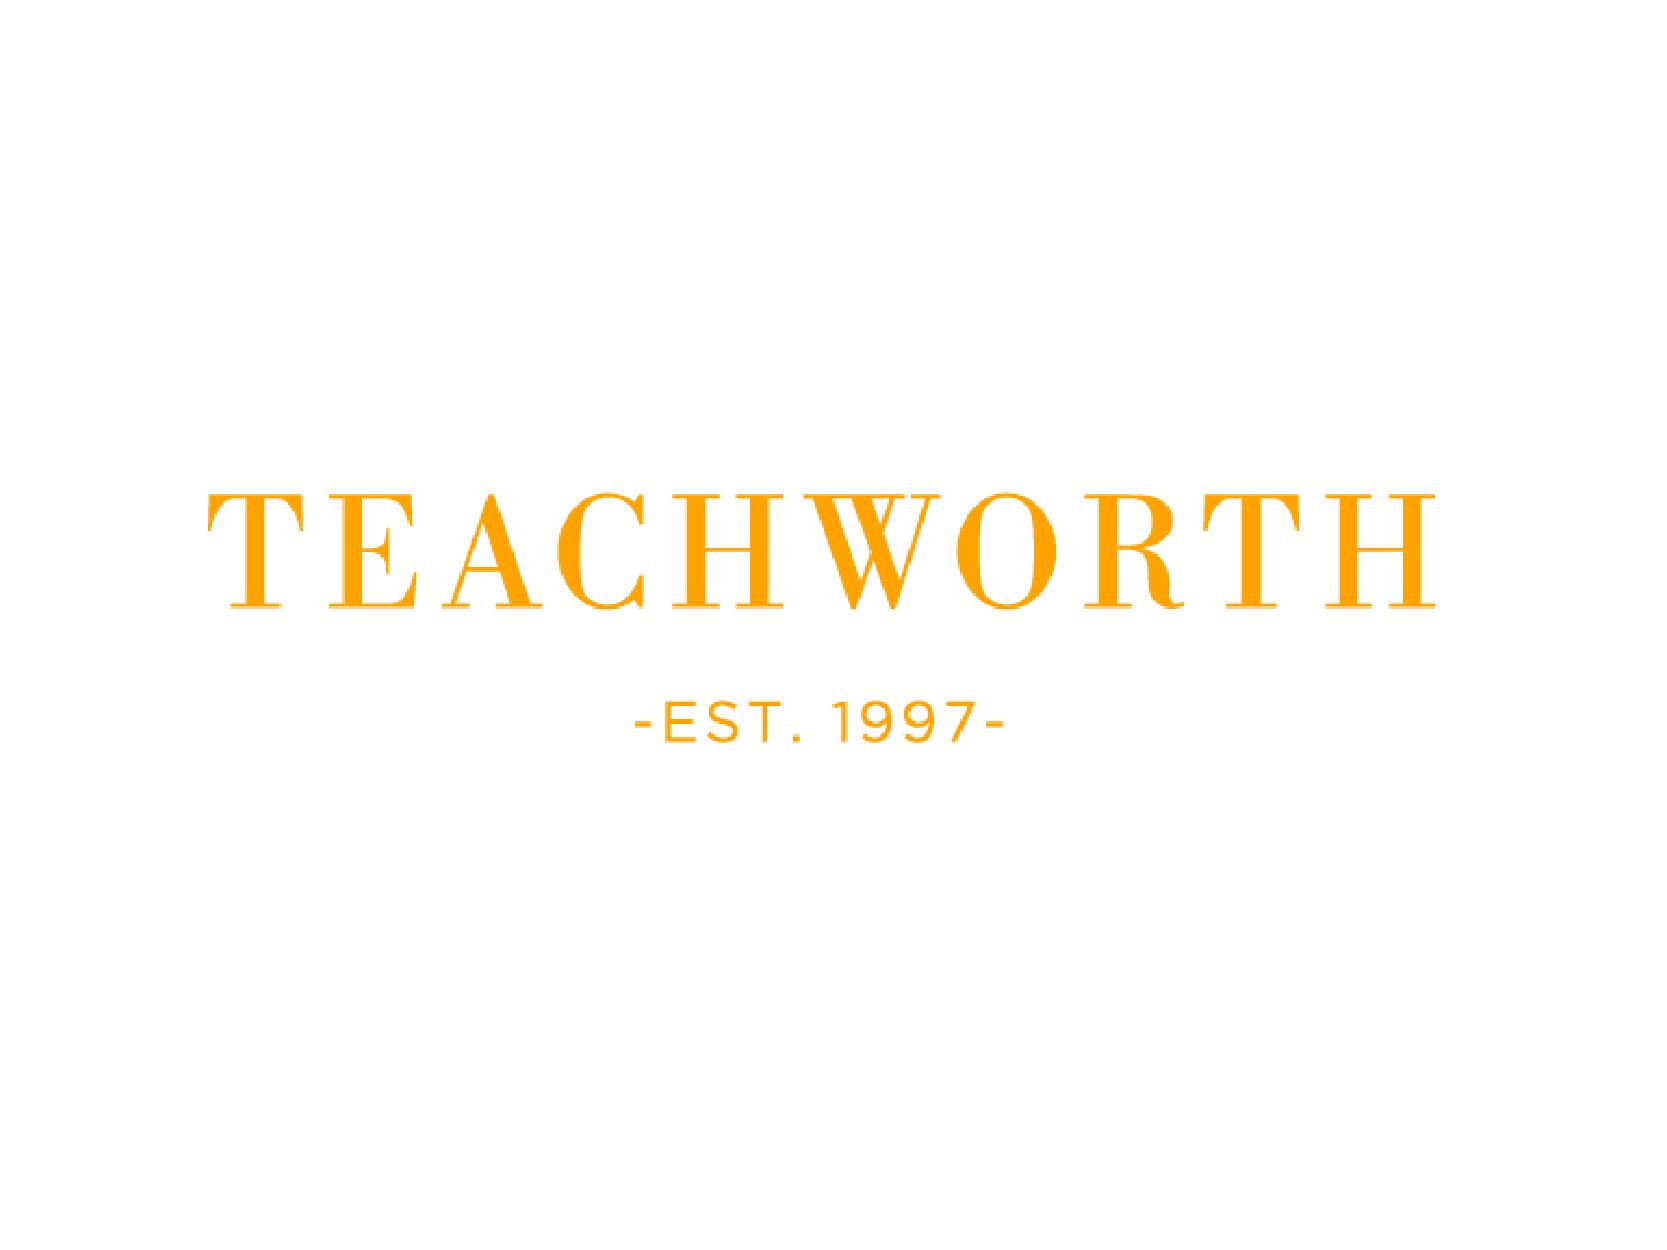 teachworthlogo-01.png